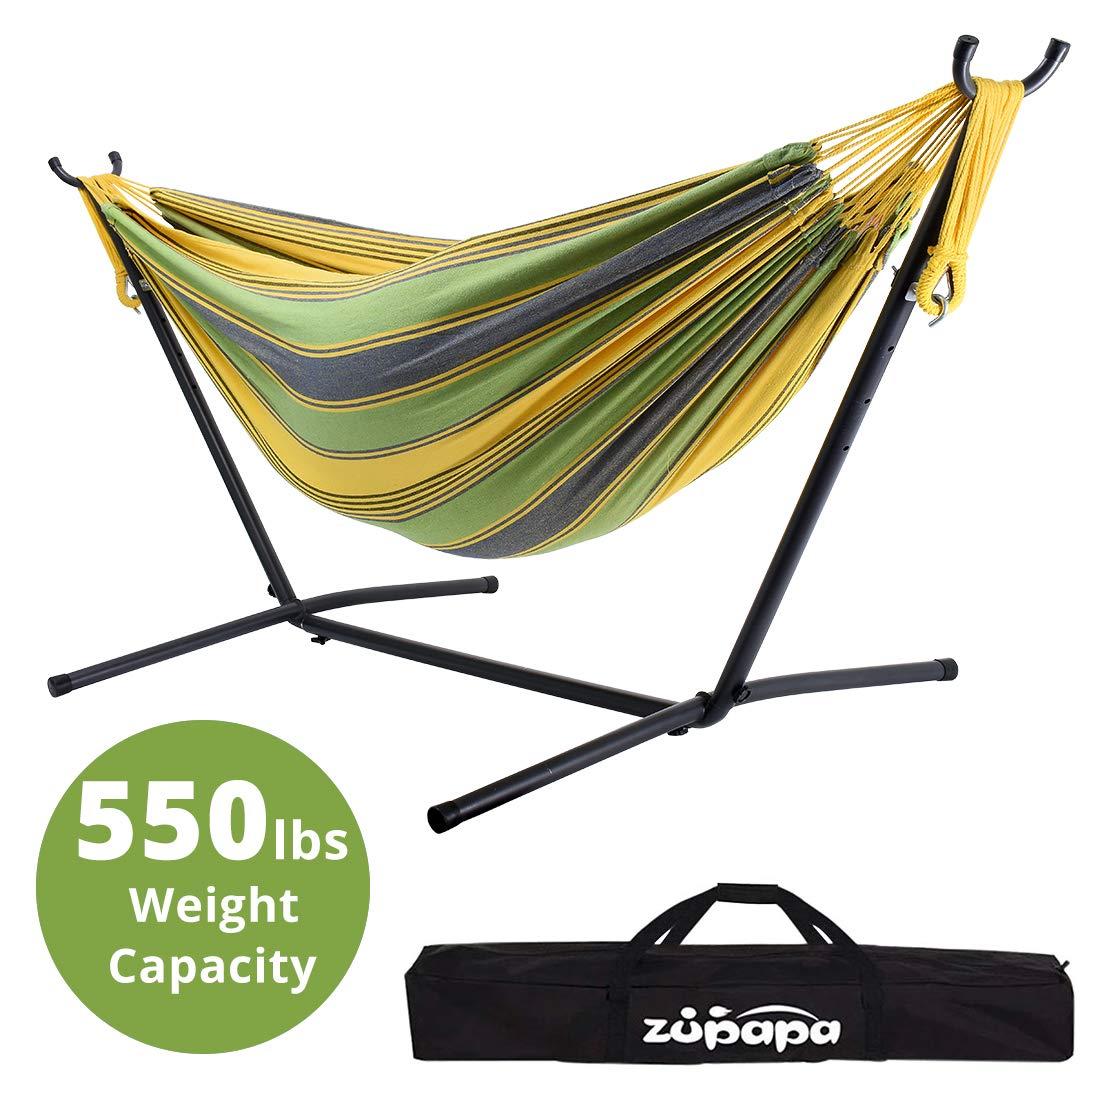 Zupapa Hammock and Stand Set, Heavy Duty Portable Combo for Indoor Bedroom Outdoor Backyard